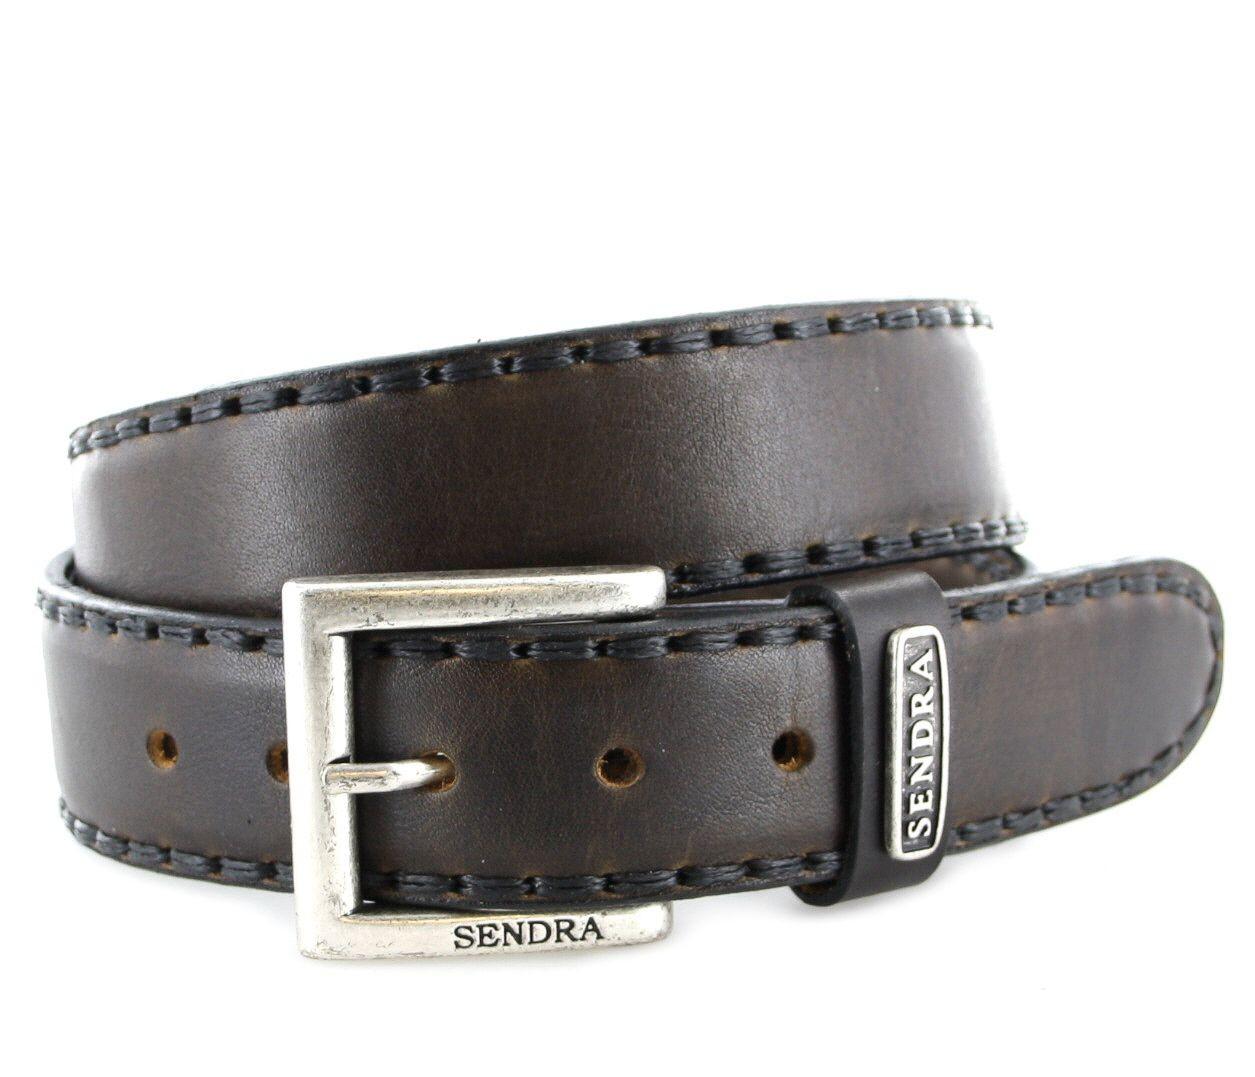 Sendra Boots 8563 Evolution Negro Ledergürtel - braun schwarz